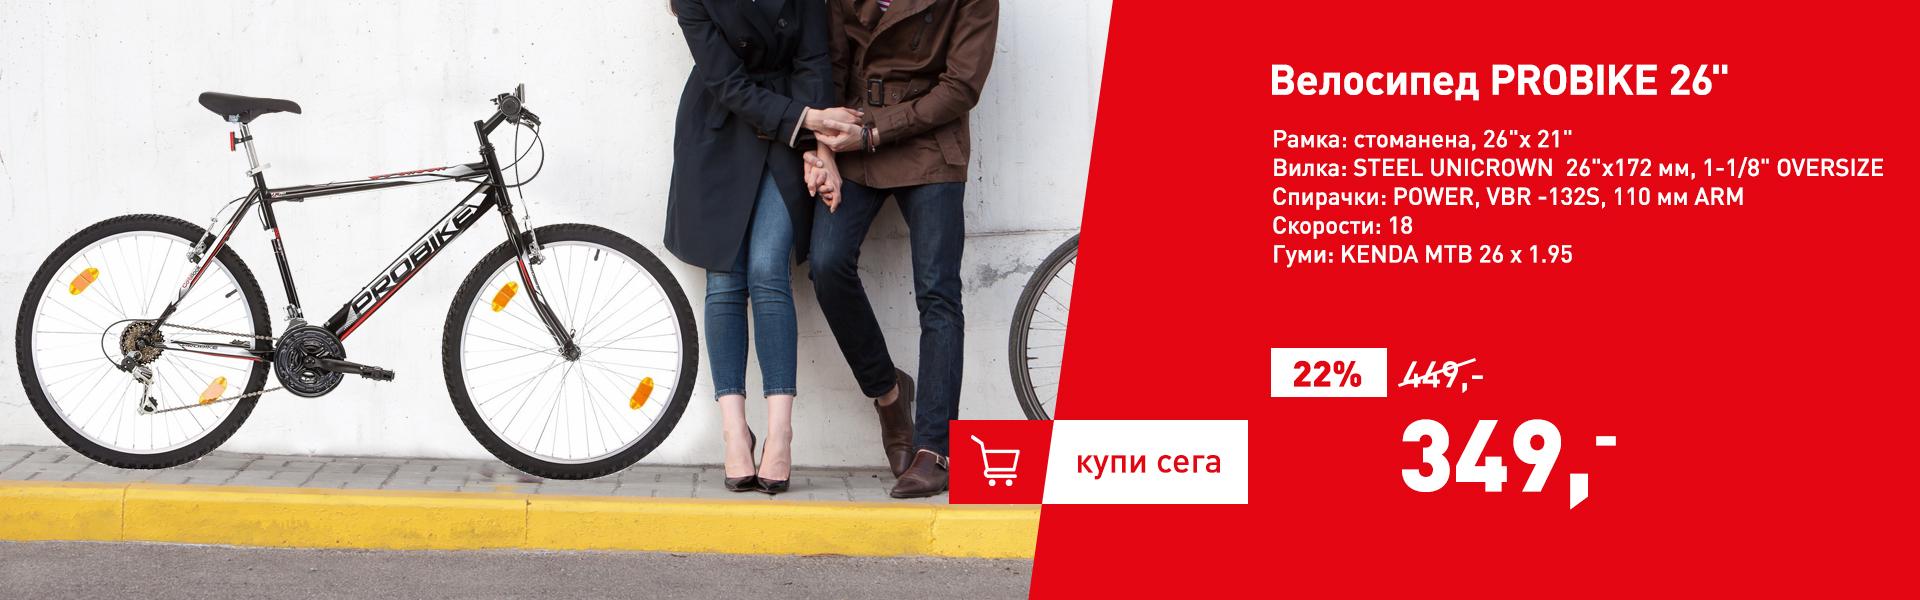 Велосипед PROBIKE